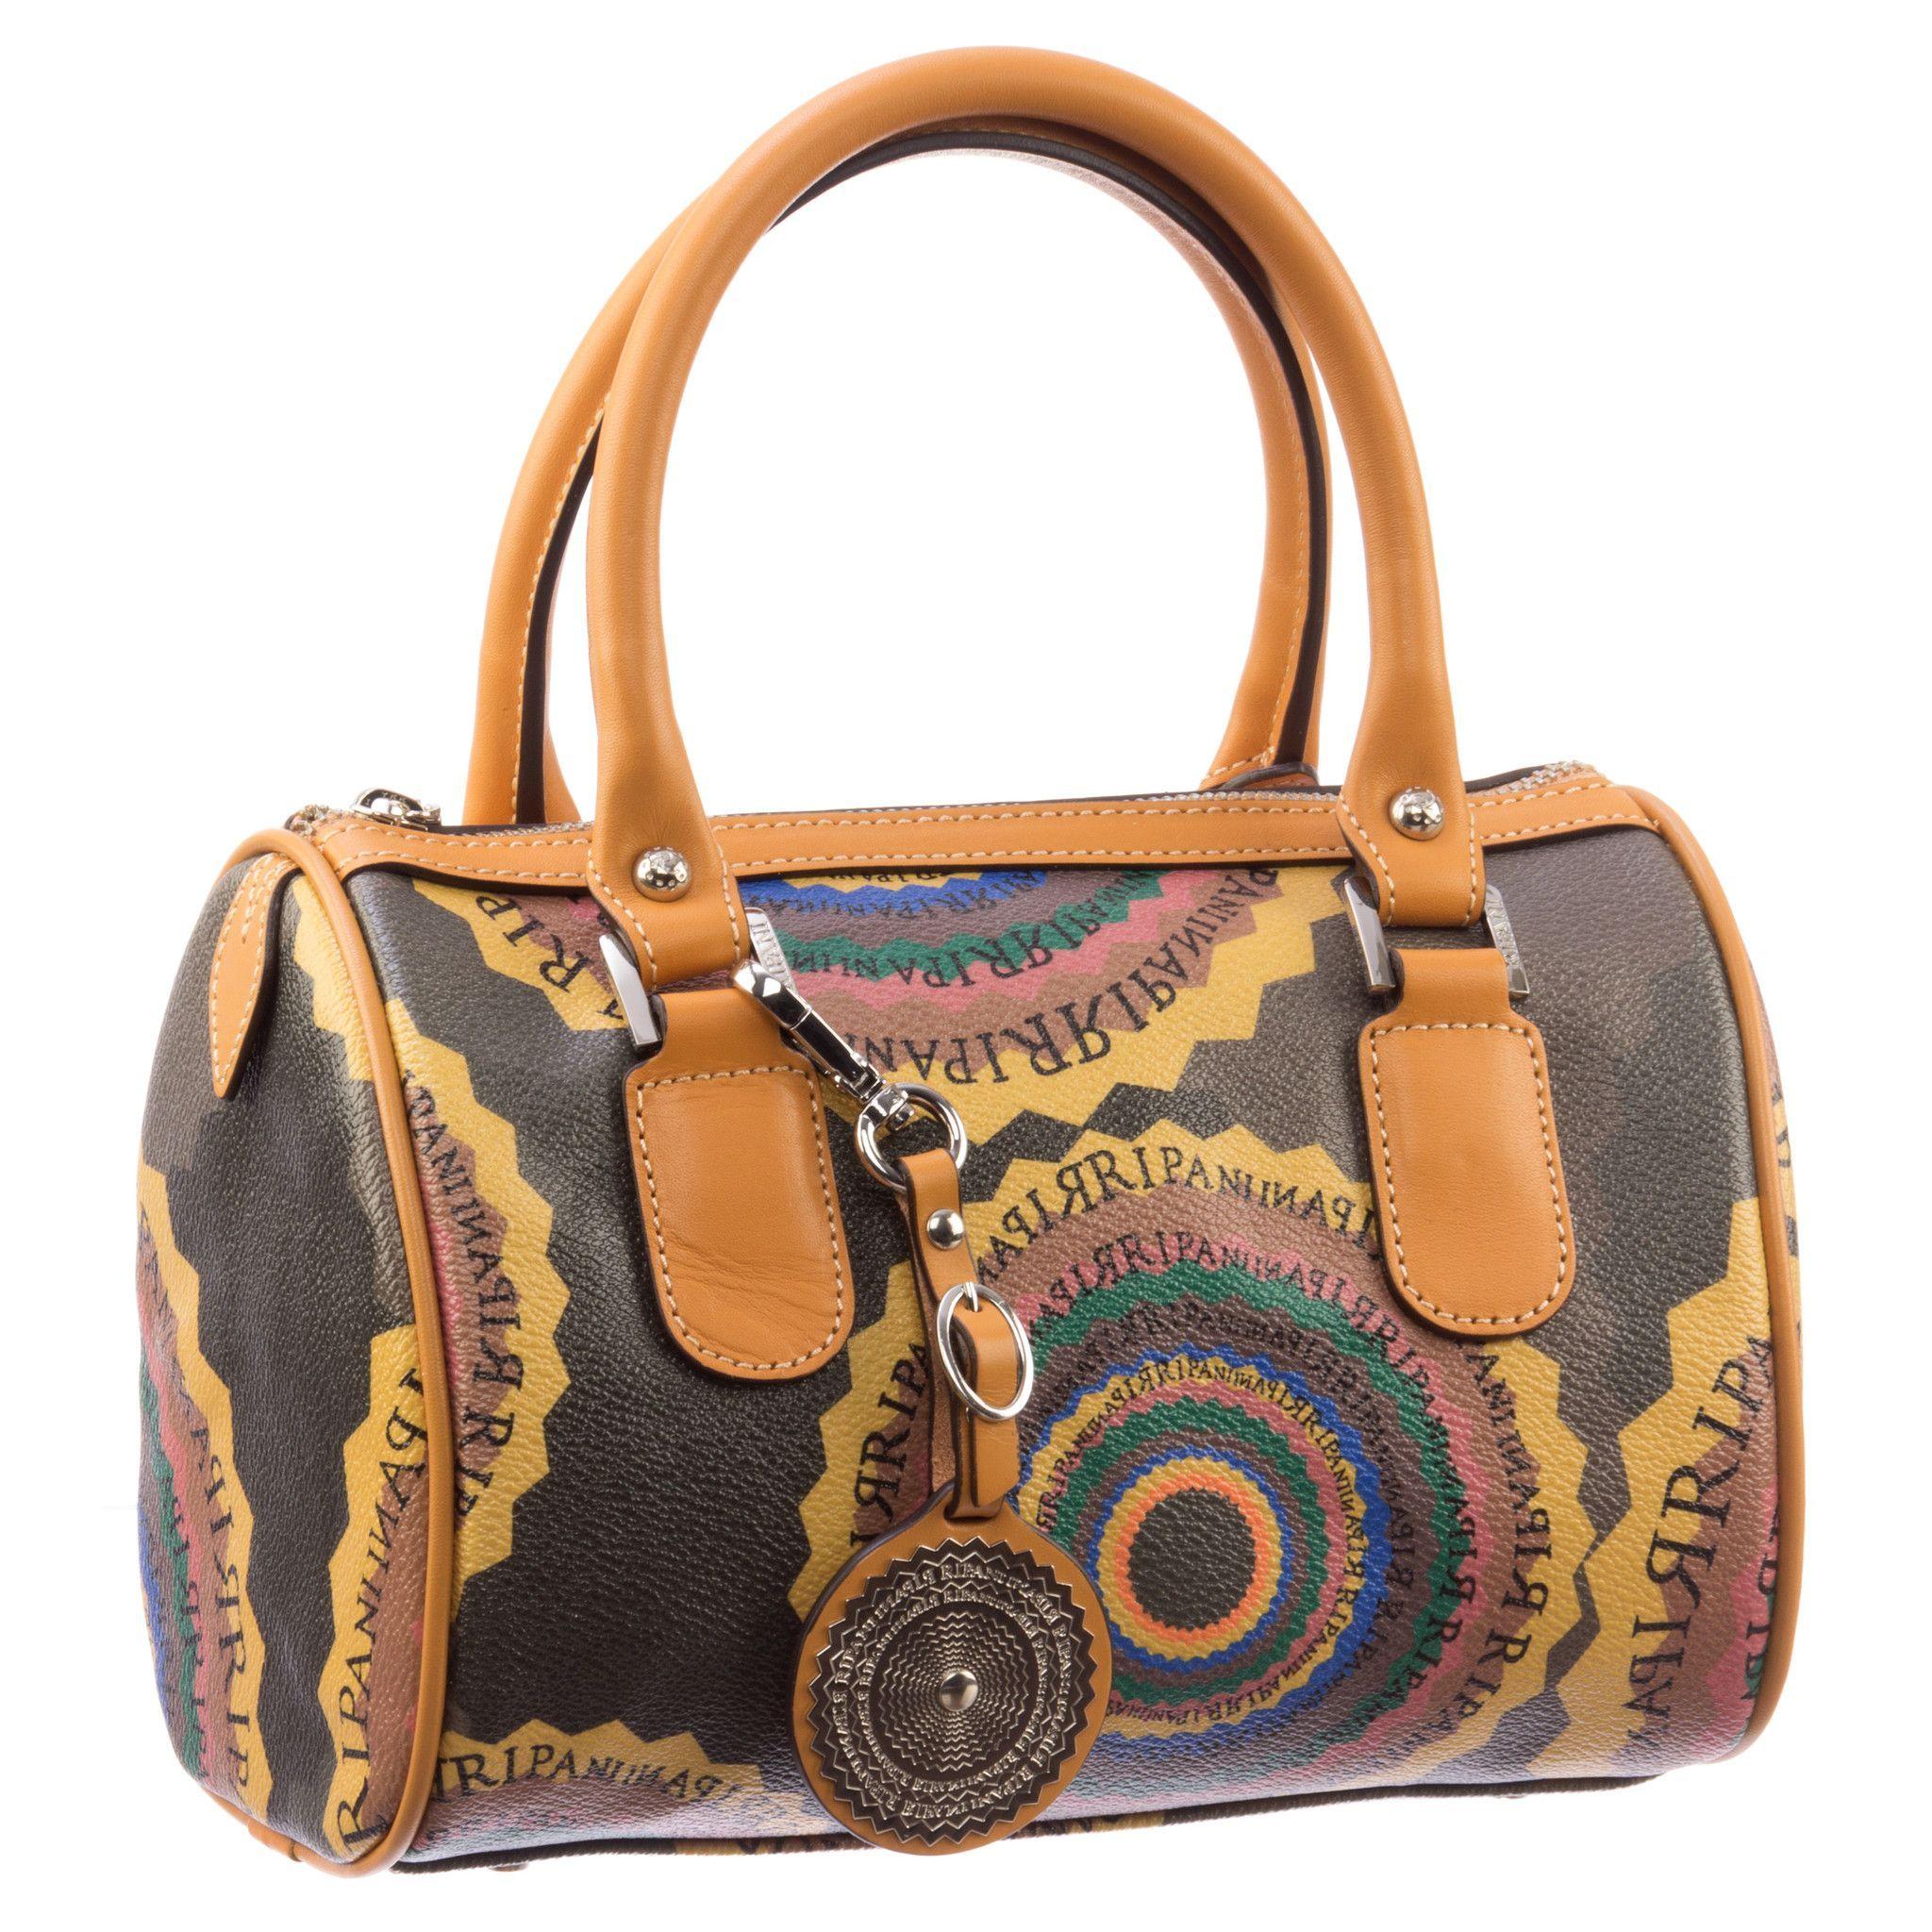 Ripani Time 0220rr Small Bowling Bag